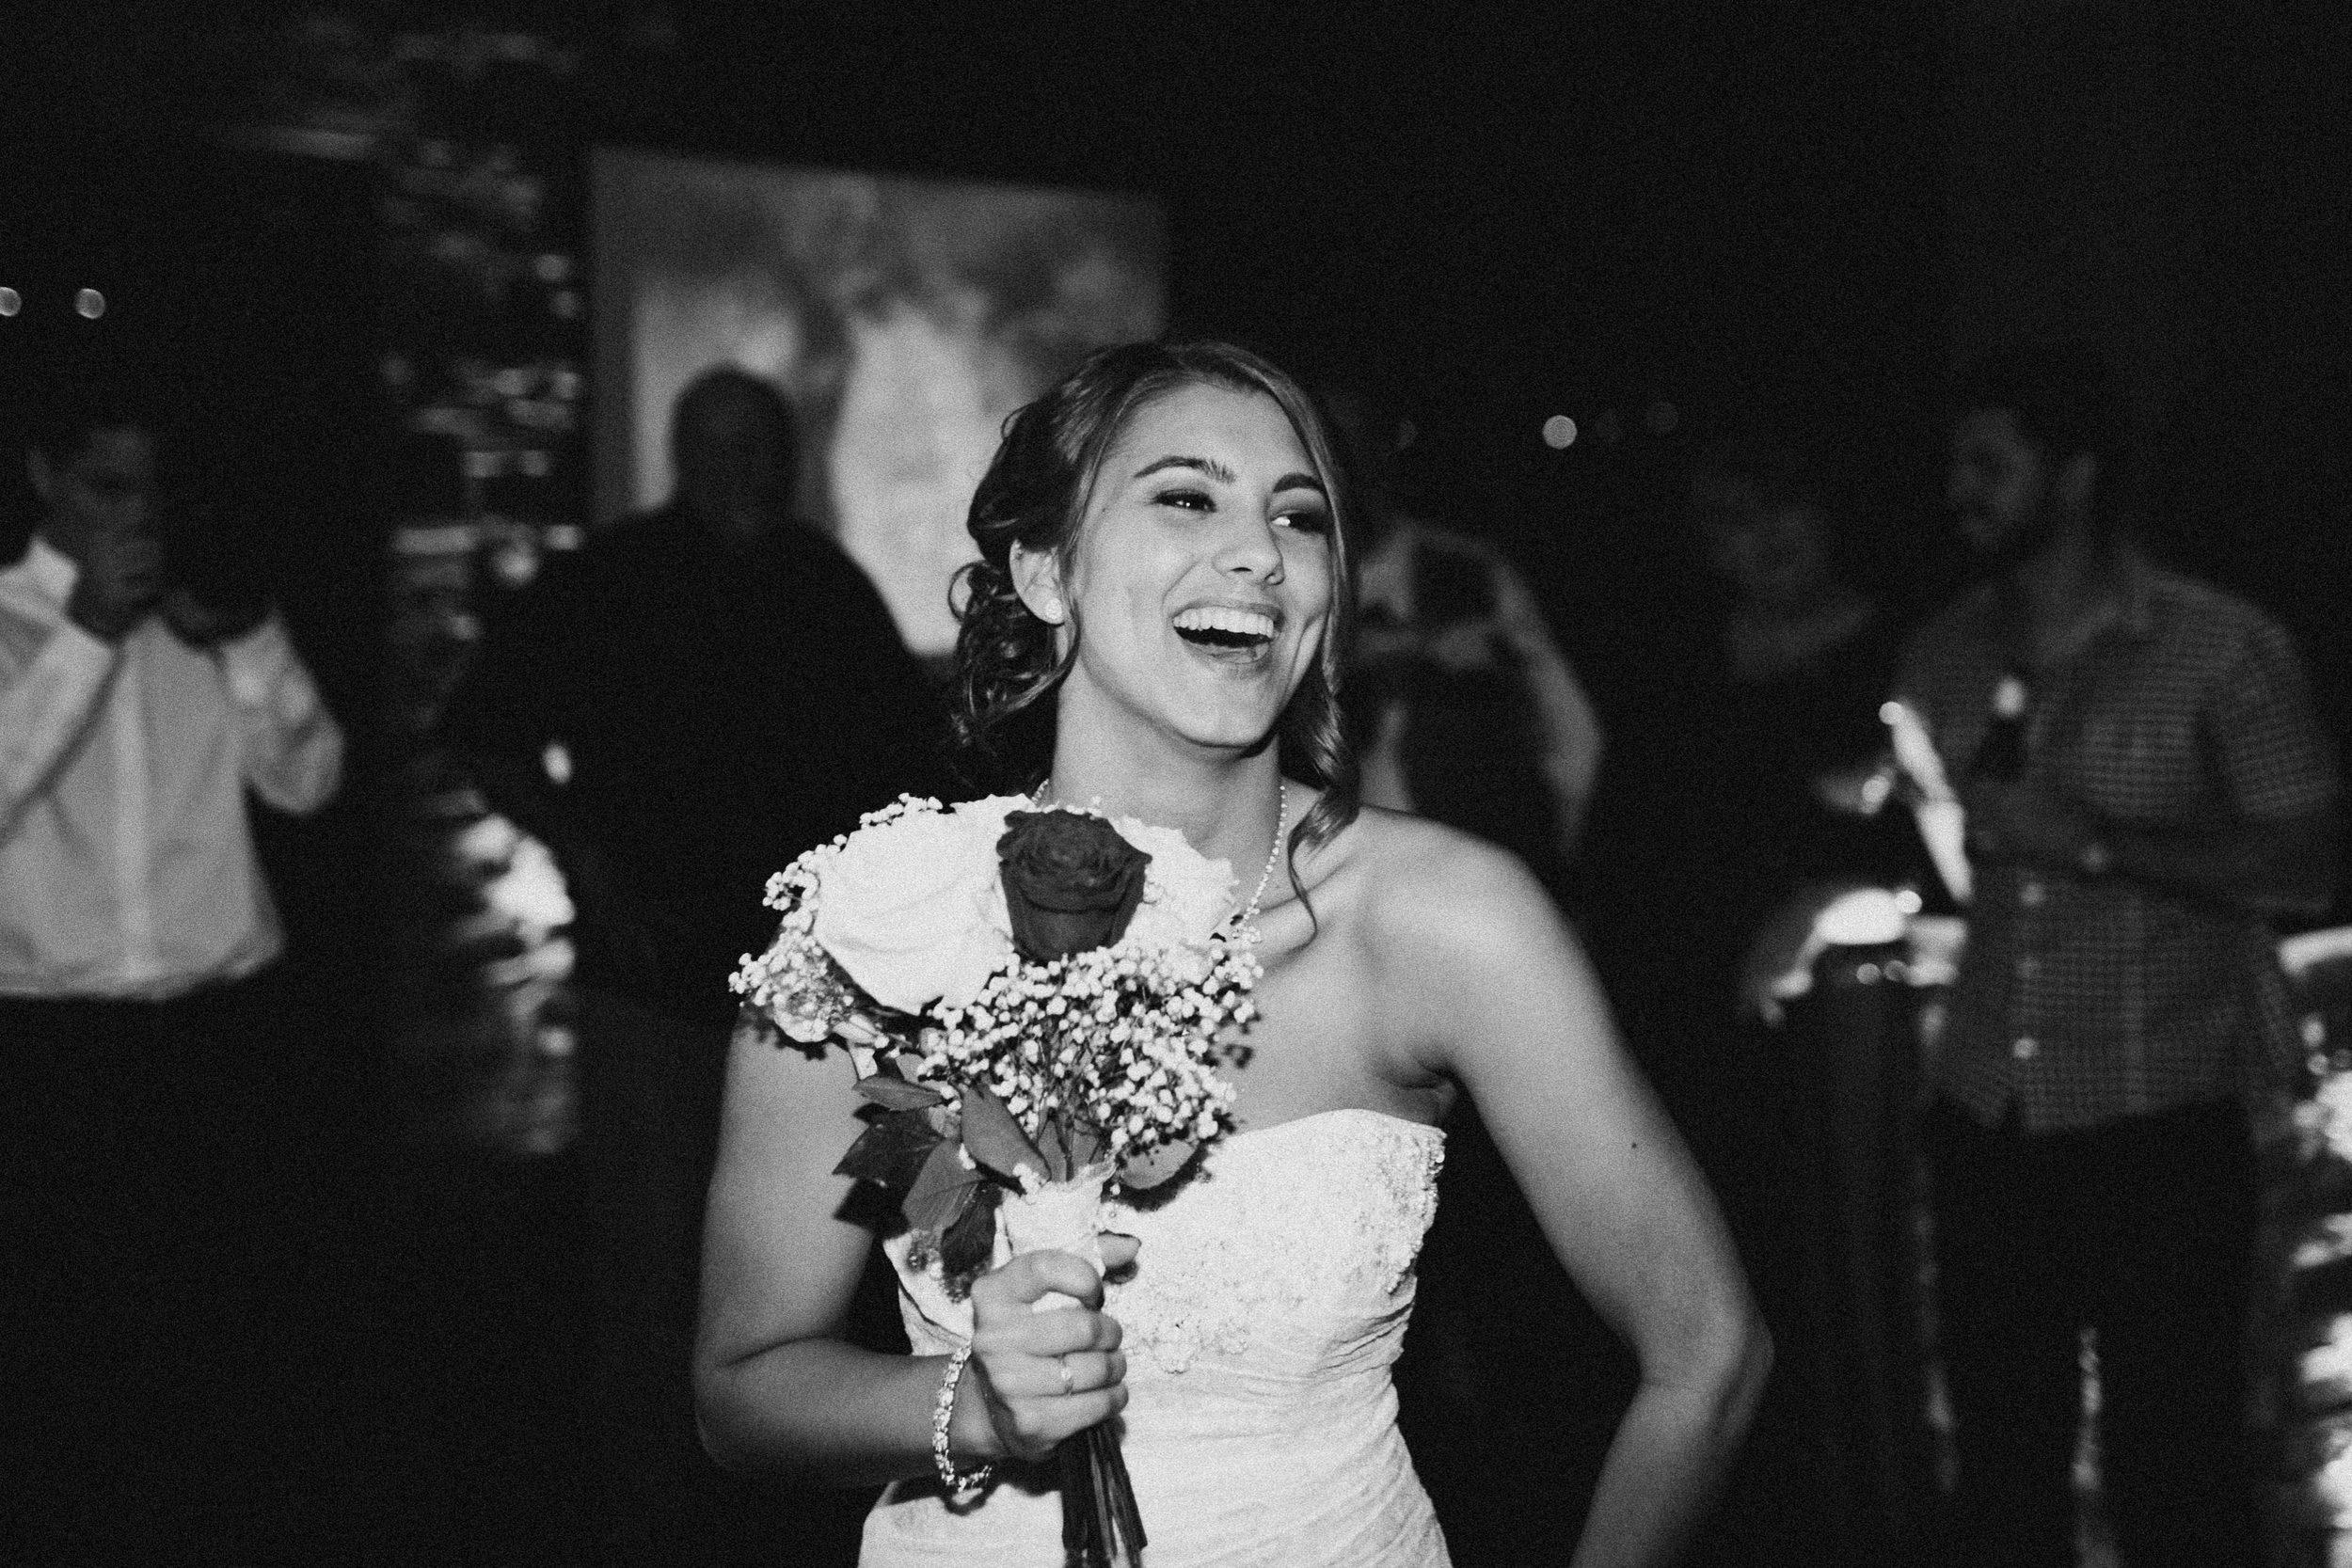 Cheyenne + Jordan - Wedding, Natalie Griffo (126 of 157).jpg